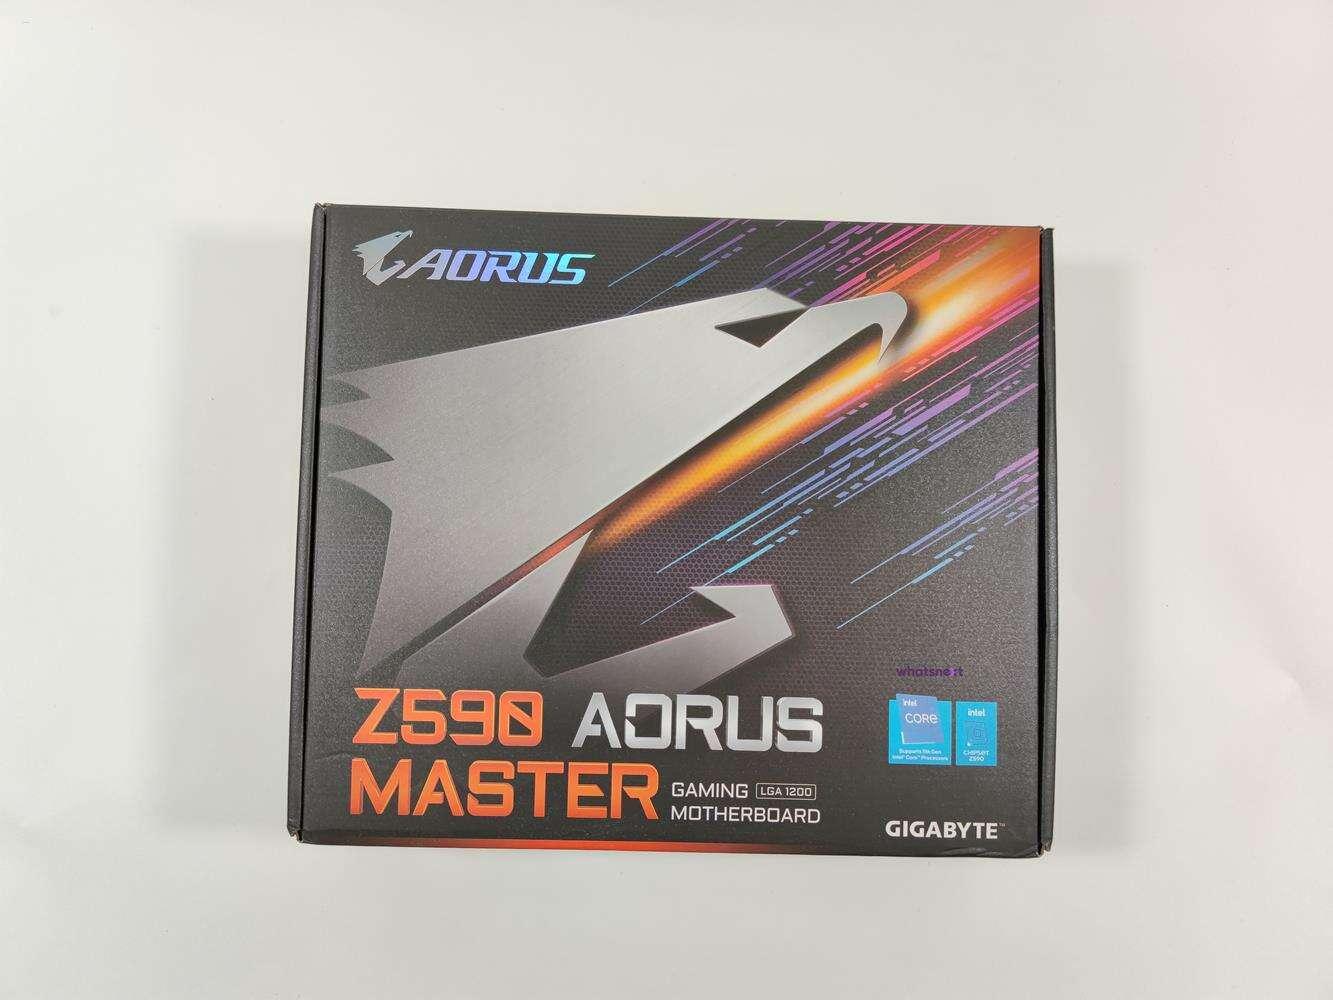 test z590 aorus master, recenzja z590 aorus master, opinia z590 aorus master